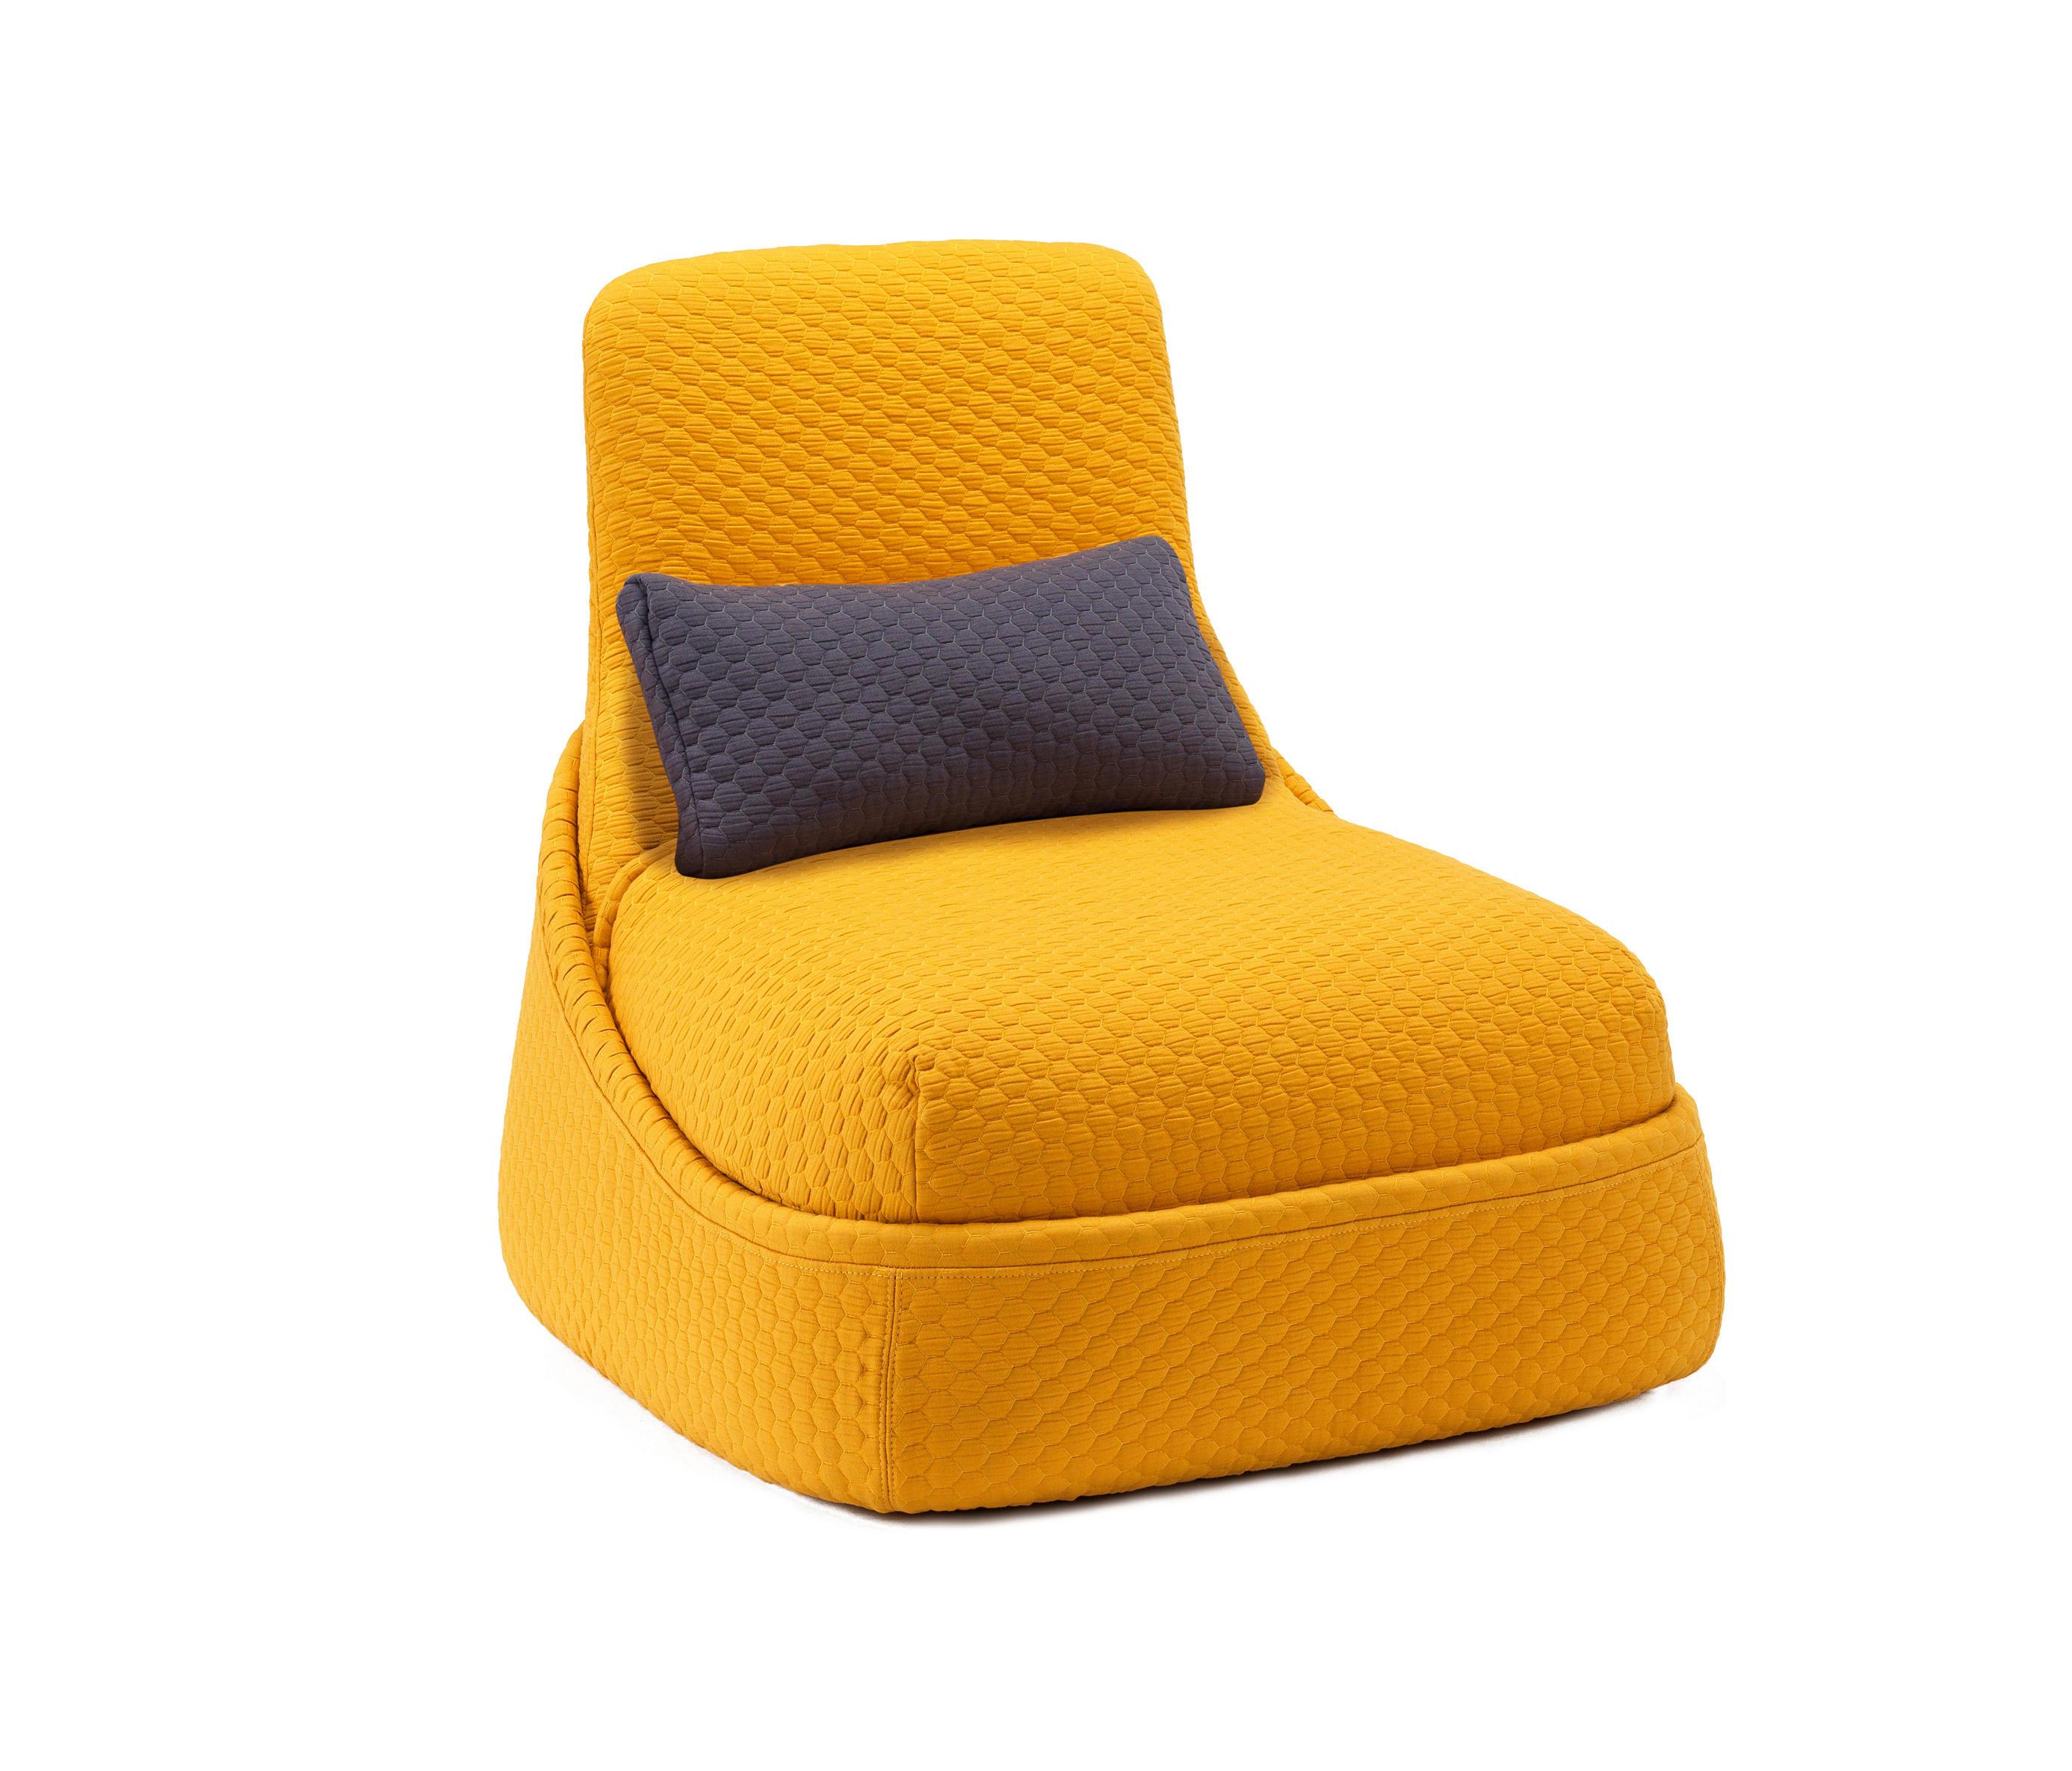 Hosu Lounge Von Coalesse | Loungesessel · Hosu Lounge Von Coalesse |  Loungesessel ...